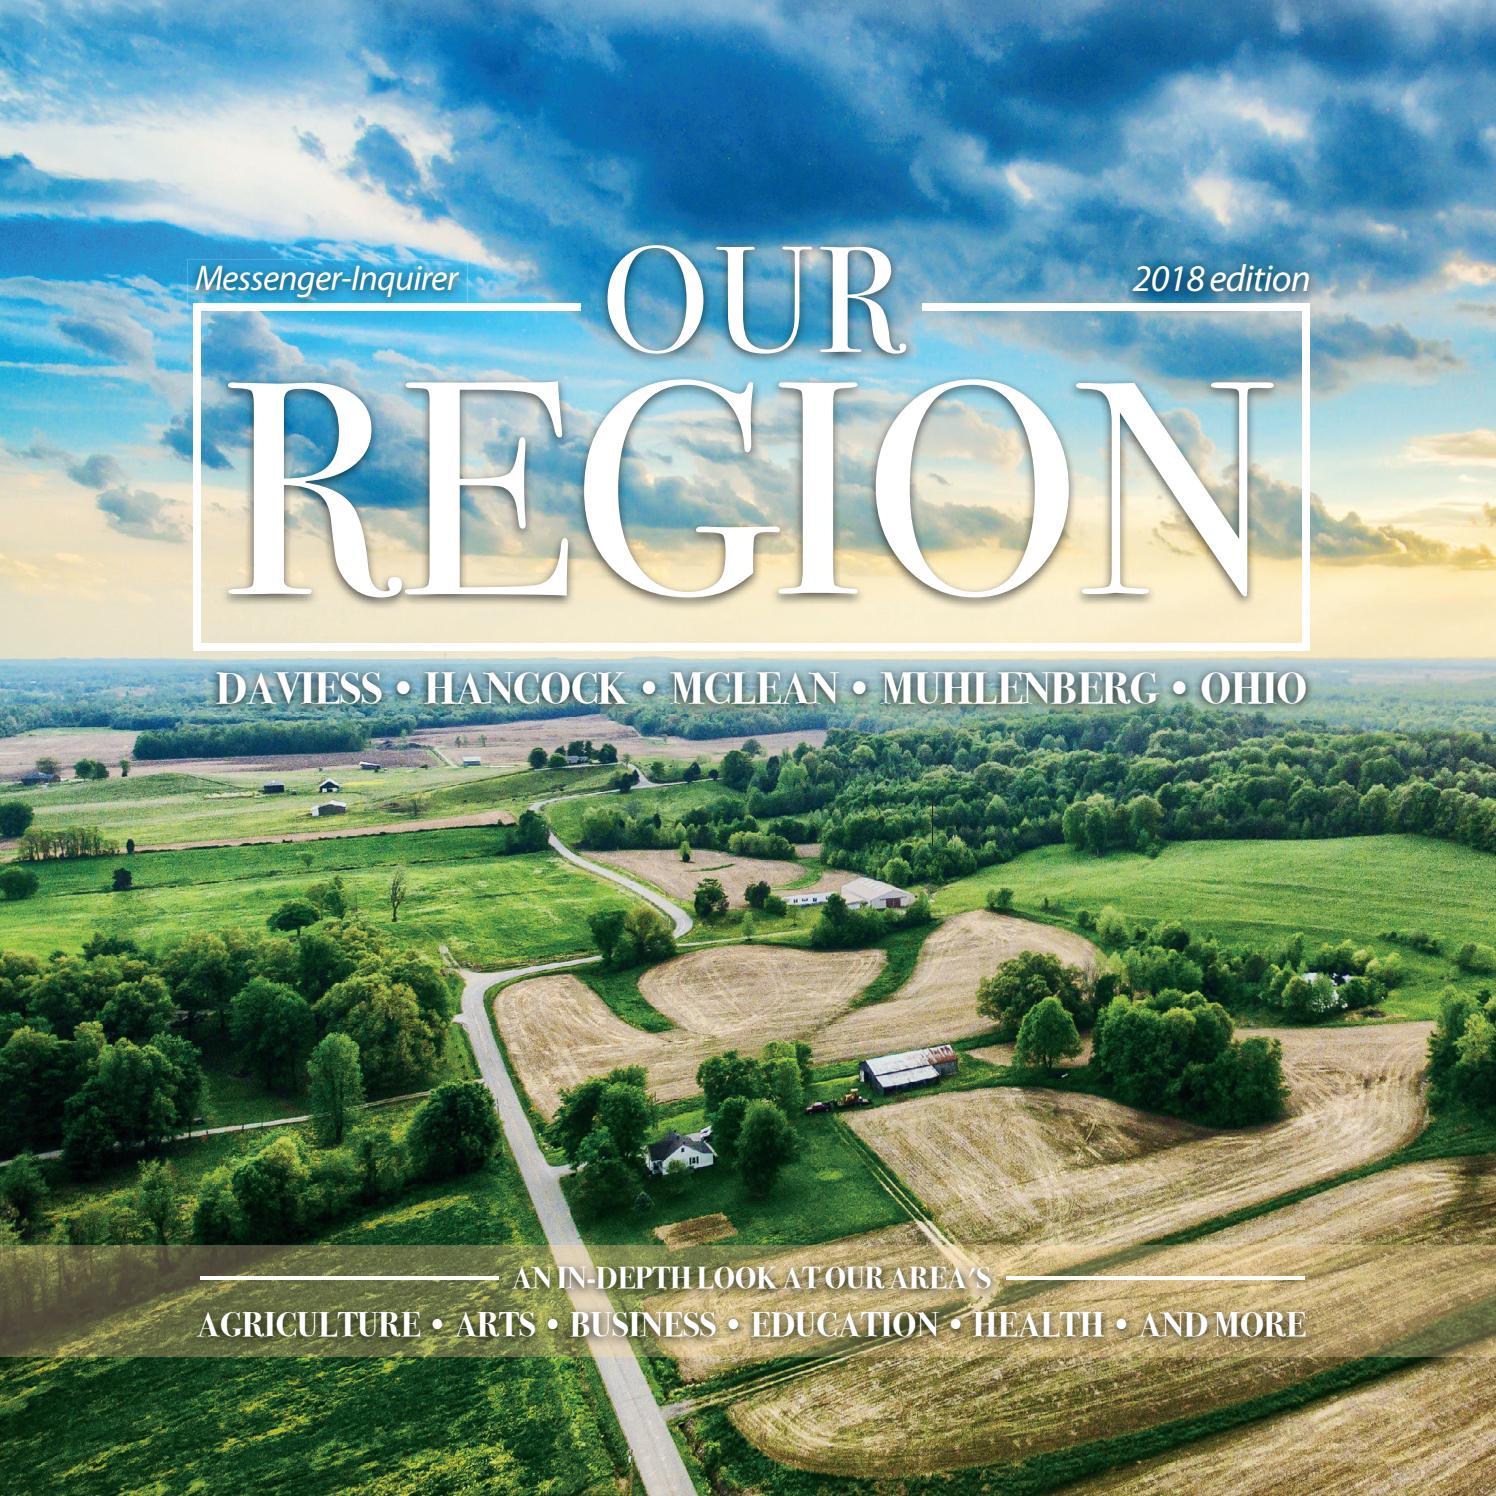 Our Region, 2018 edition